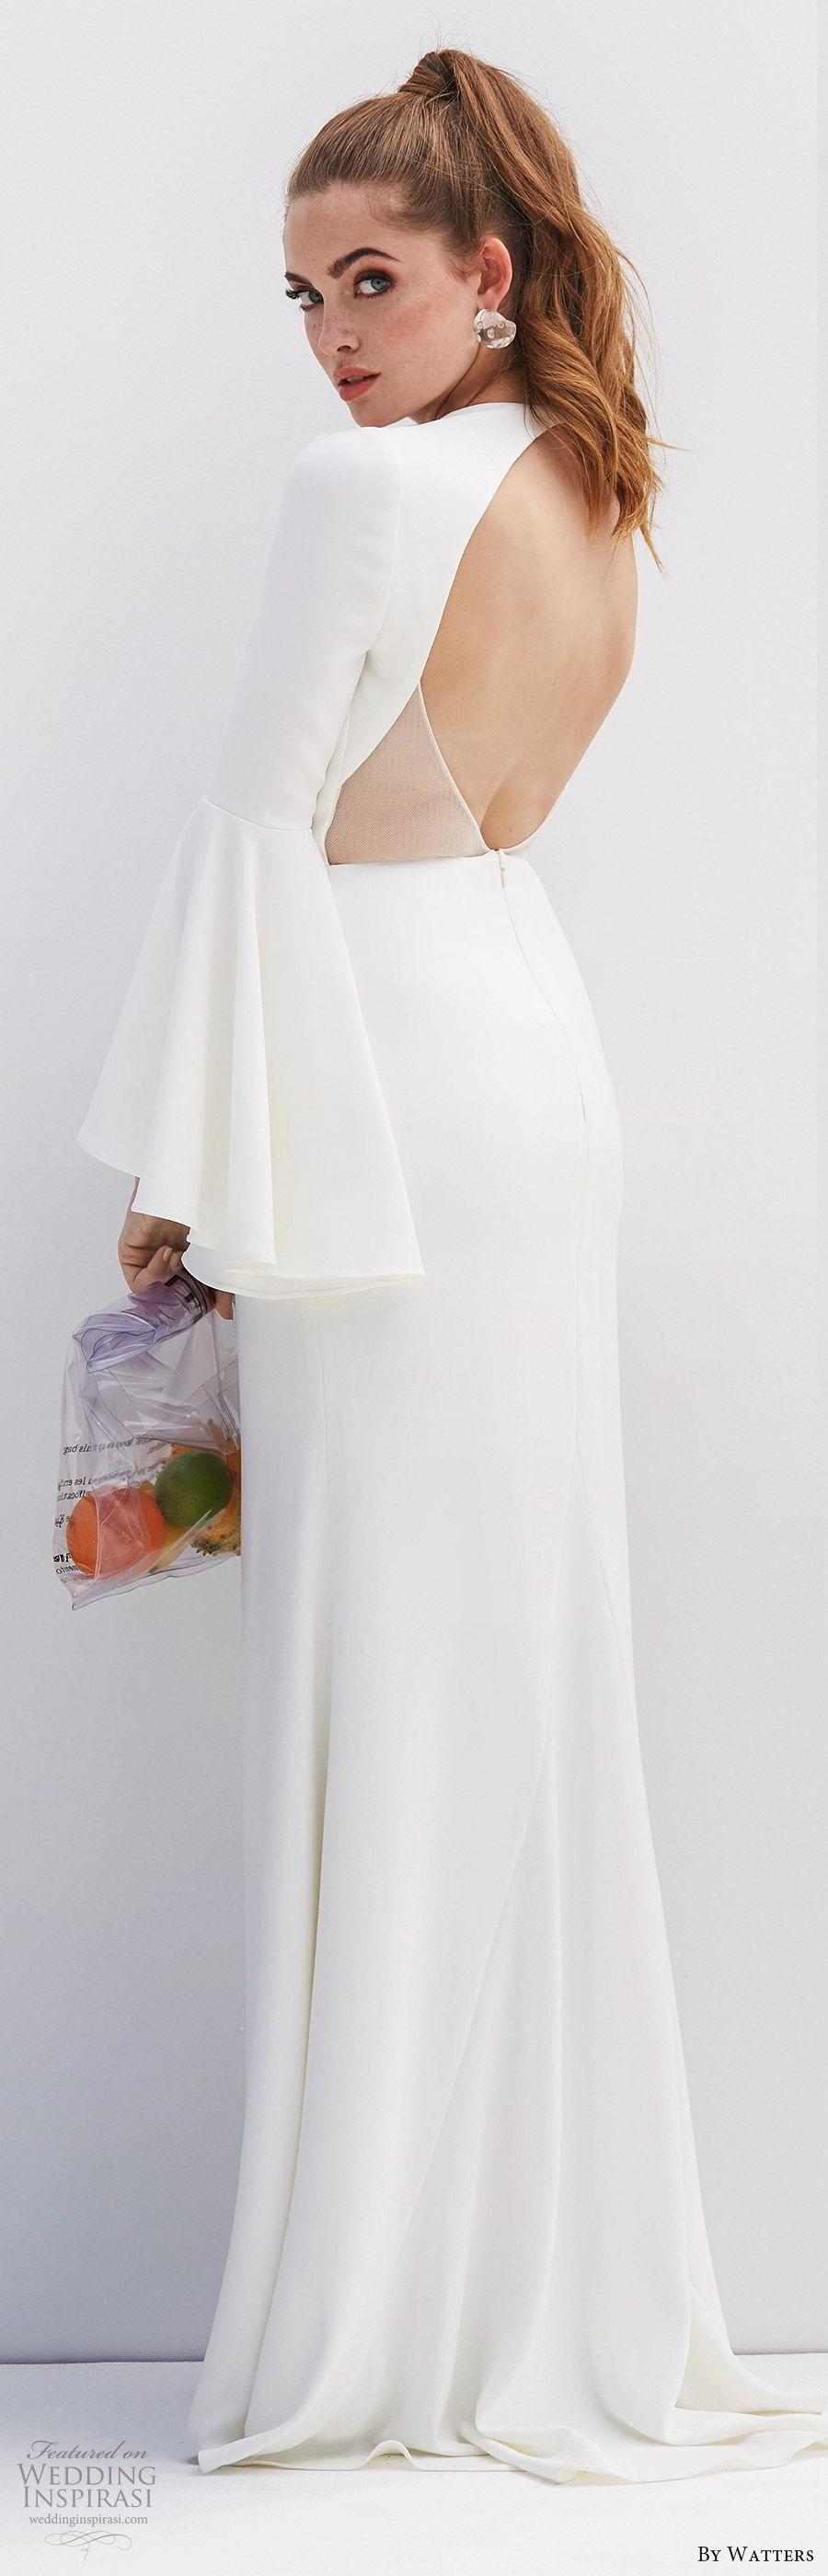 by watters 2020 bridal long bell sleeves deep v neckline sheer side open back minimally embellished sheath wedding dress (7) clean modern chic sweep train bv